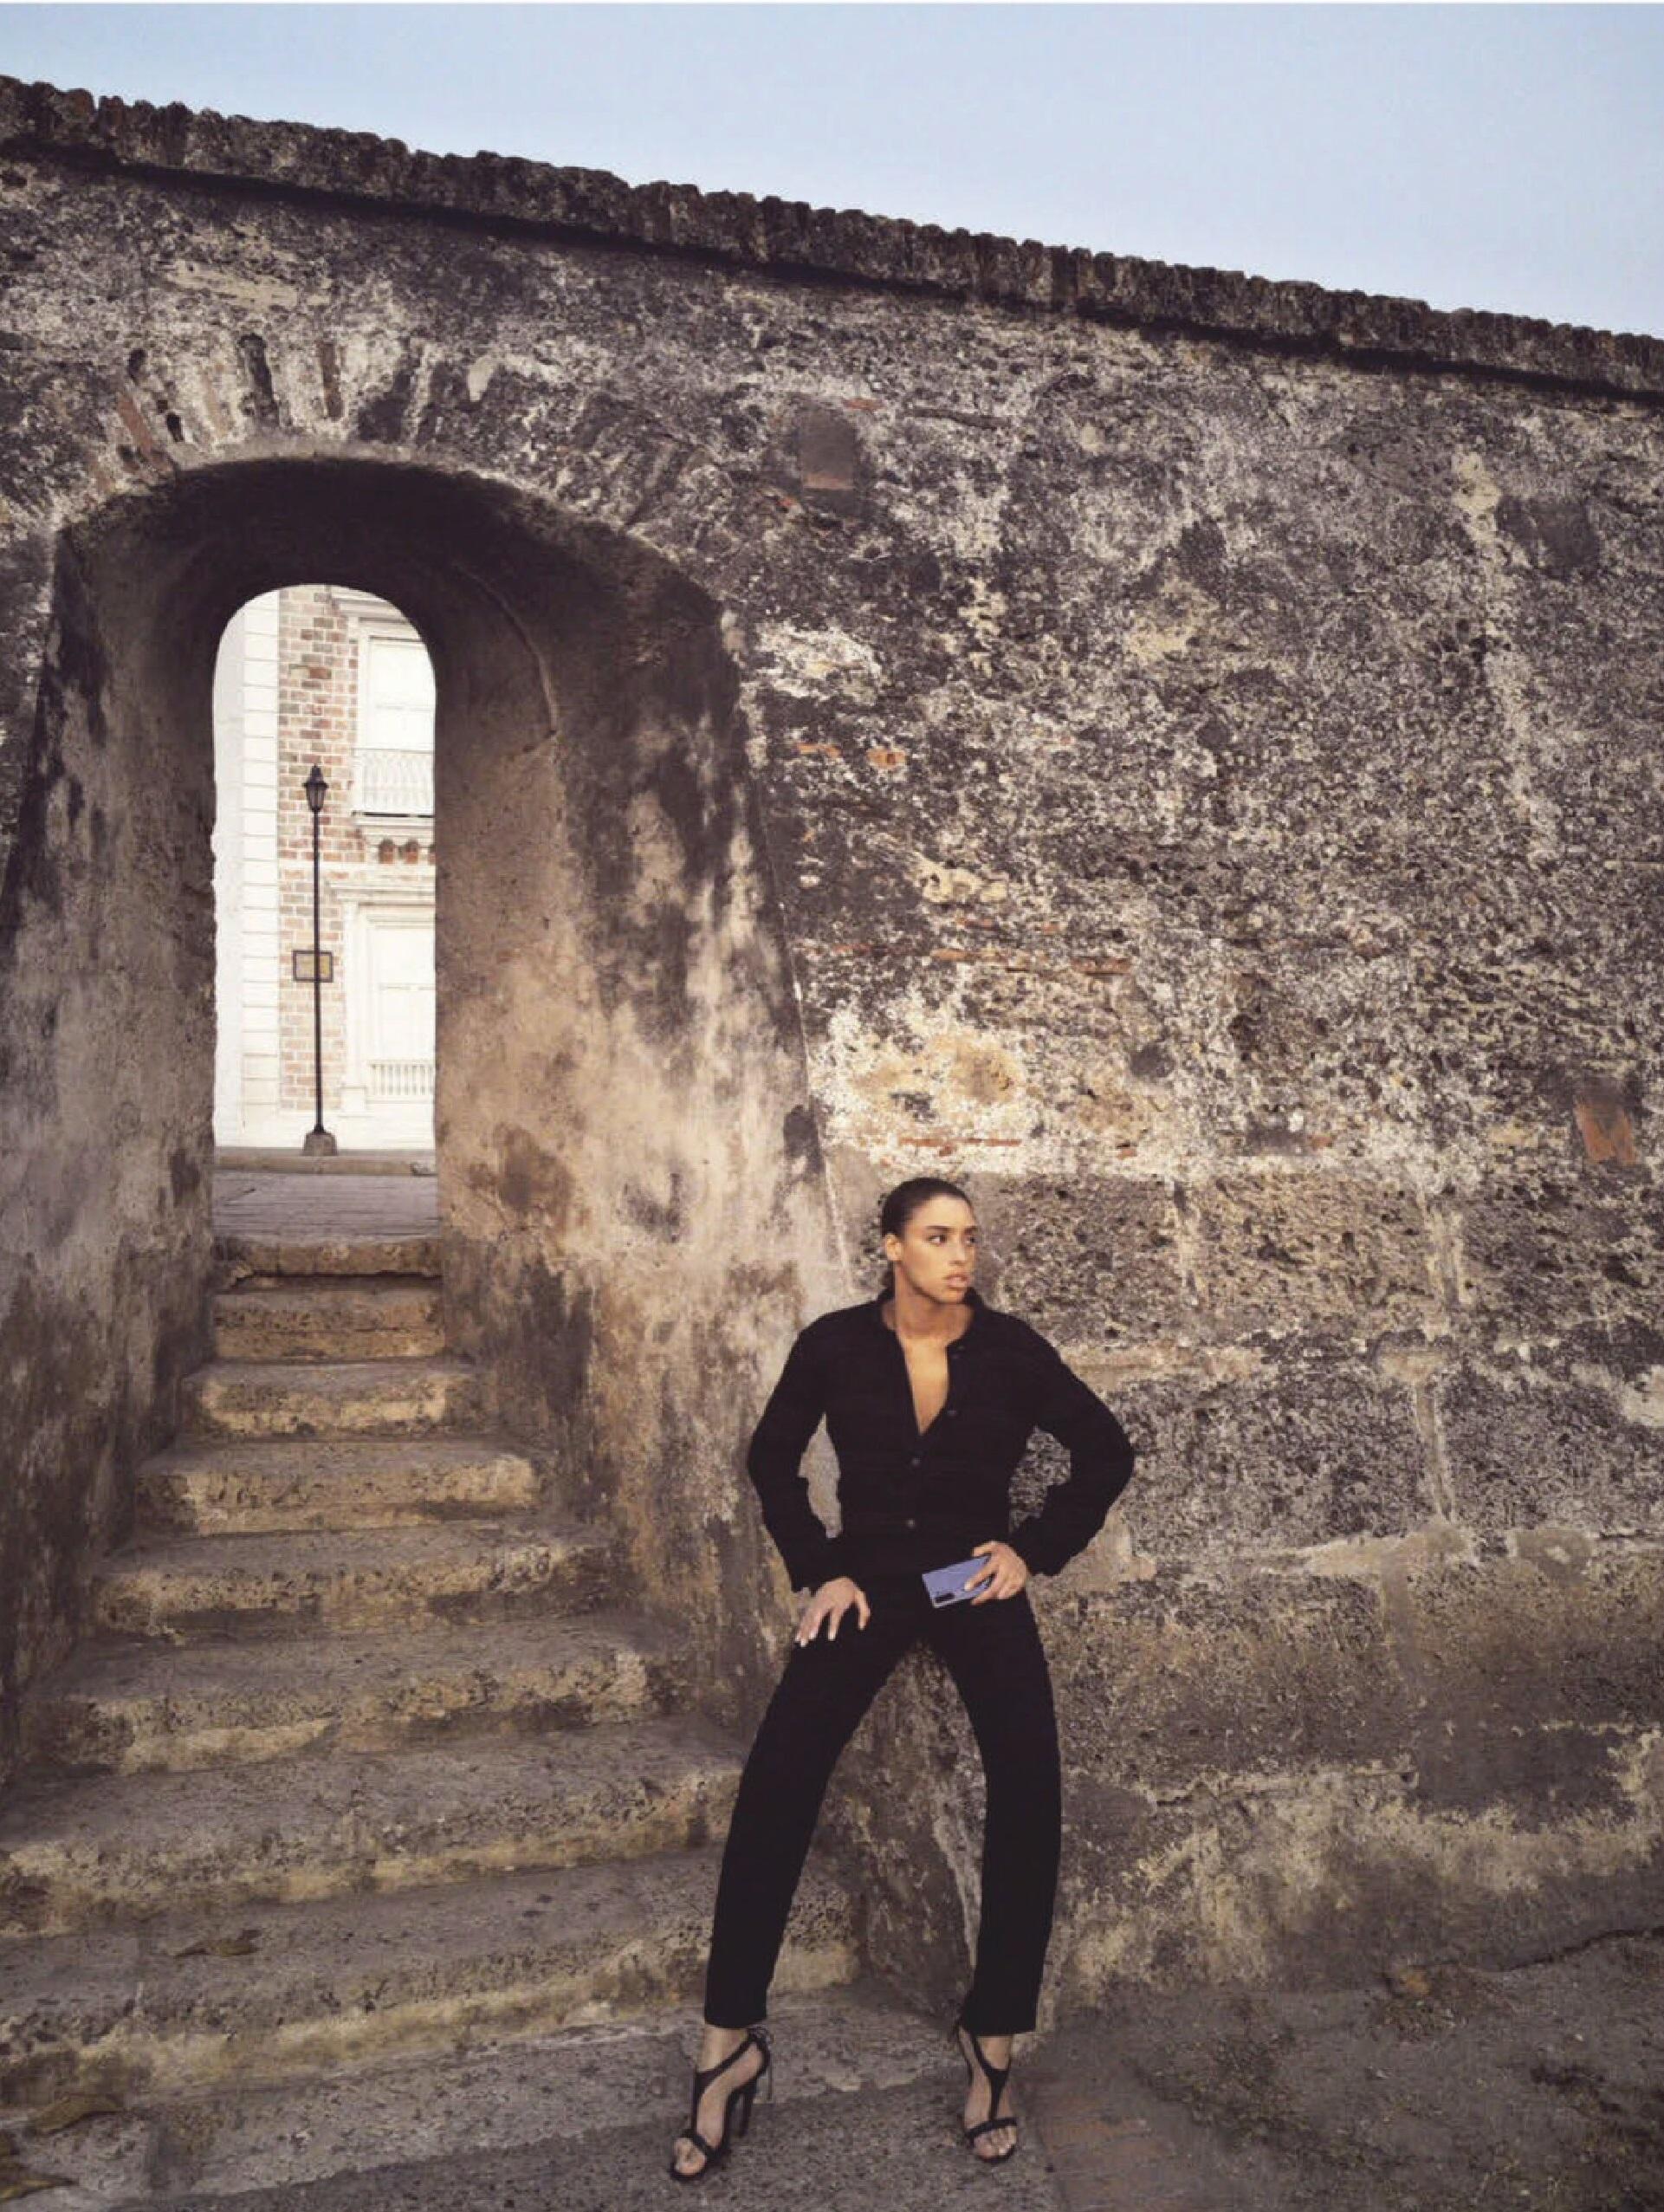 Khadija-Red-Thunder-Bjorn-Iooss-Vogue-Latin-America-May-2019- (11).jpg